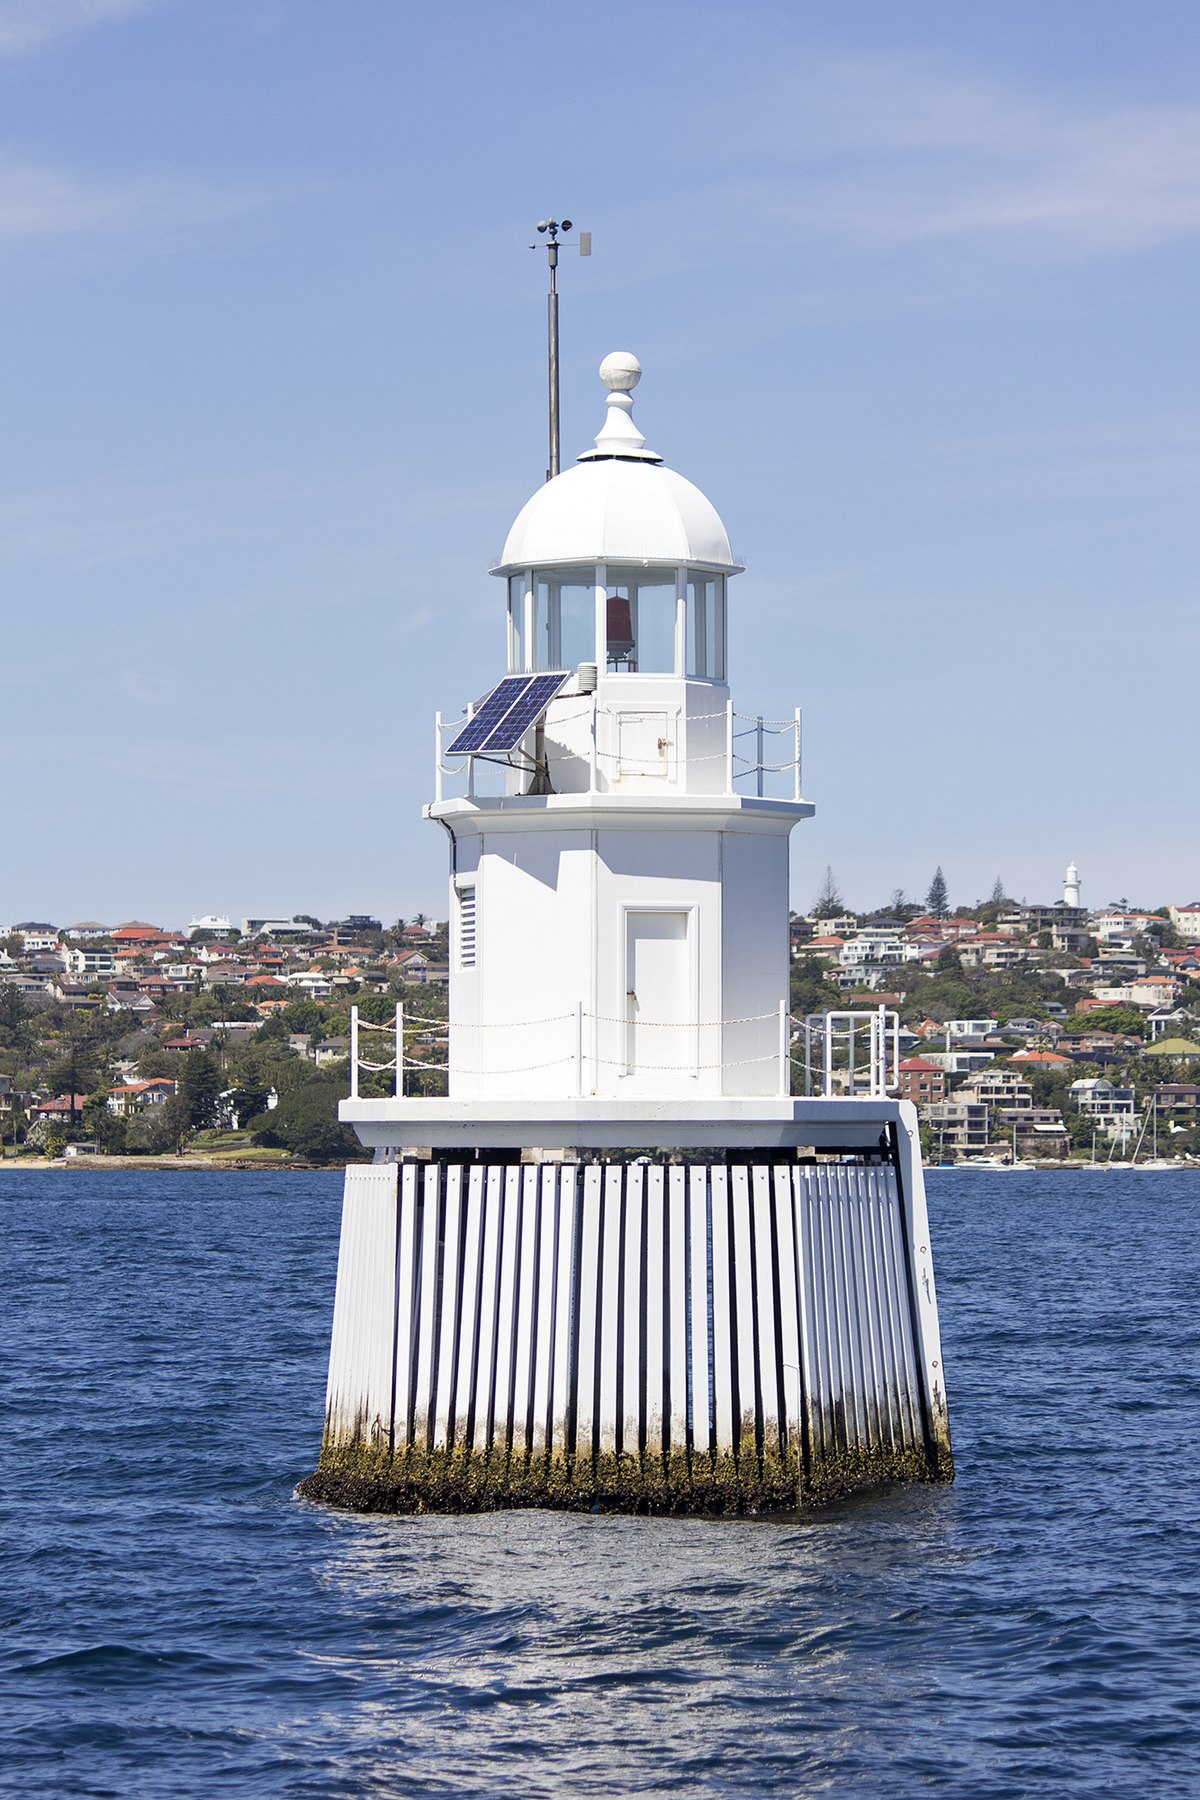 Western Channel Pile Light Wikipedia - Wedding Cakes Sydney West